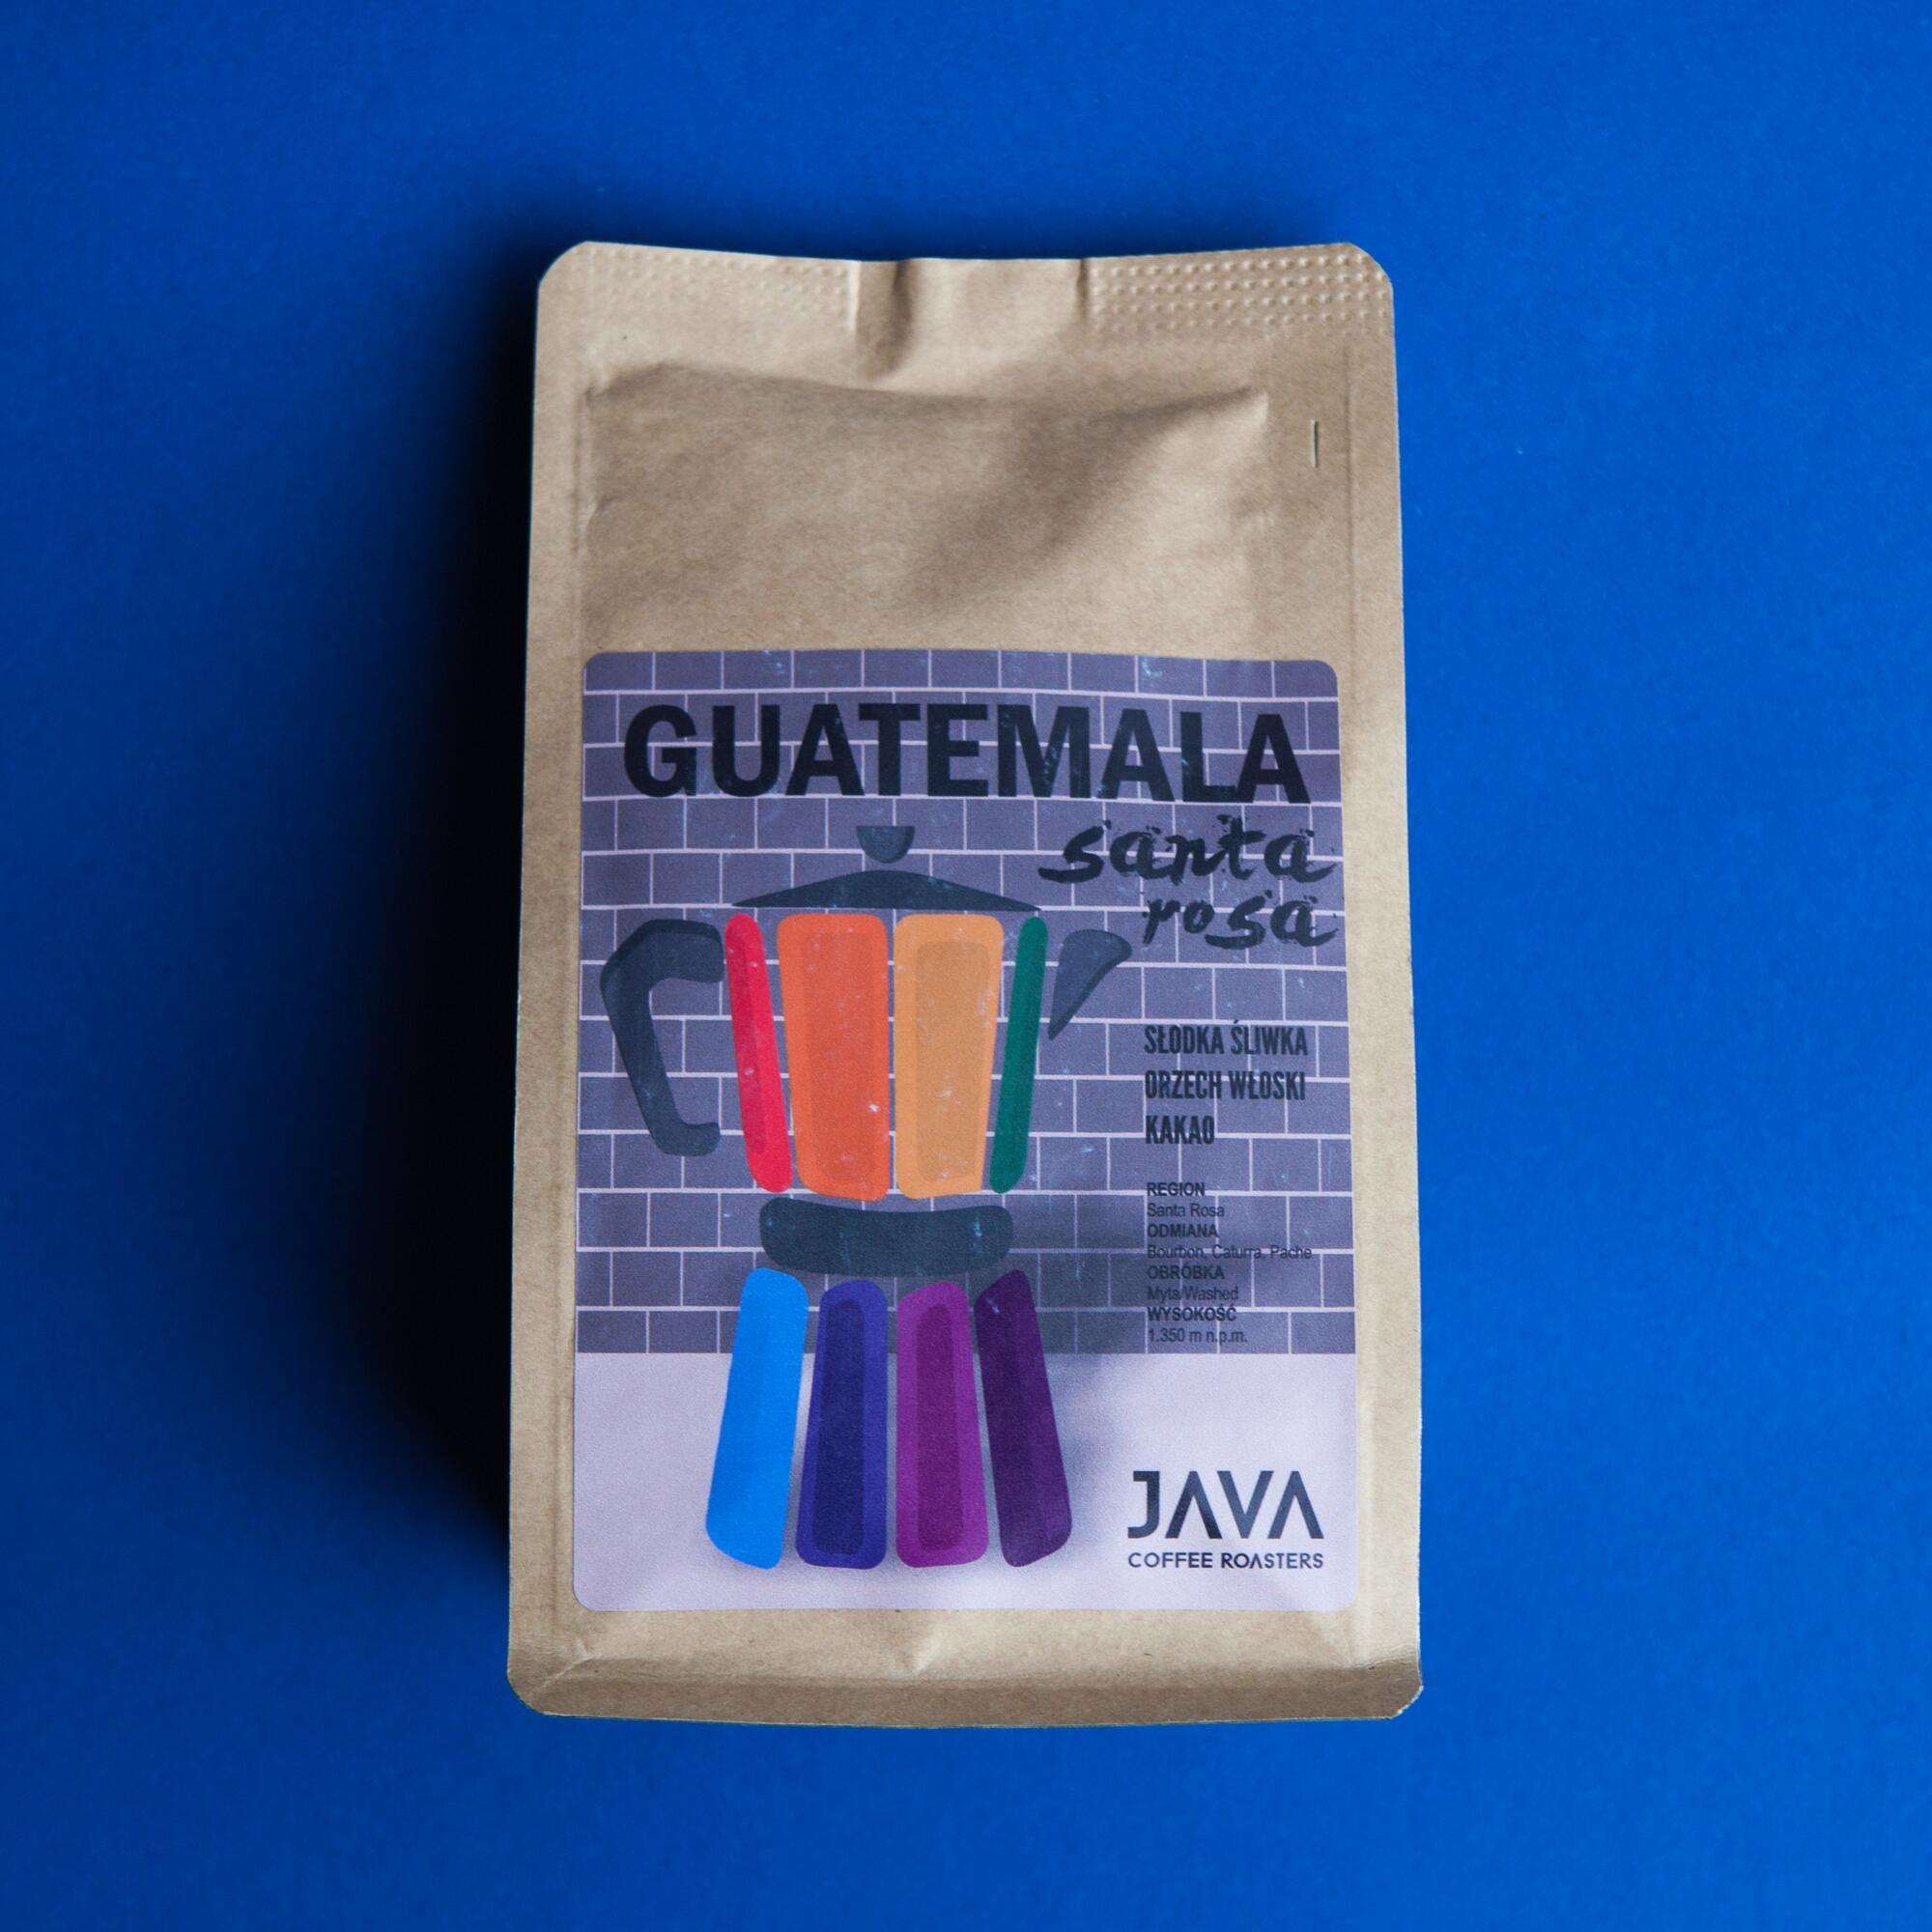 Java Gwatemala Santa Rosa 250g - Coffee Gang | JestemSlow.pl